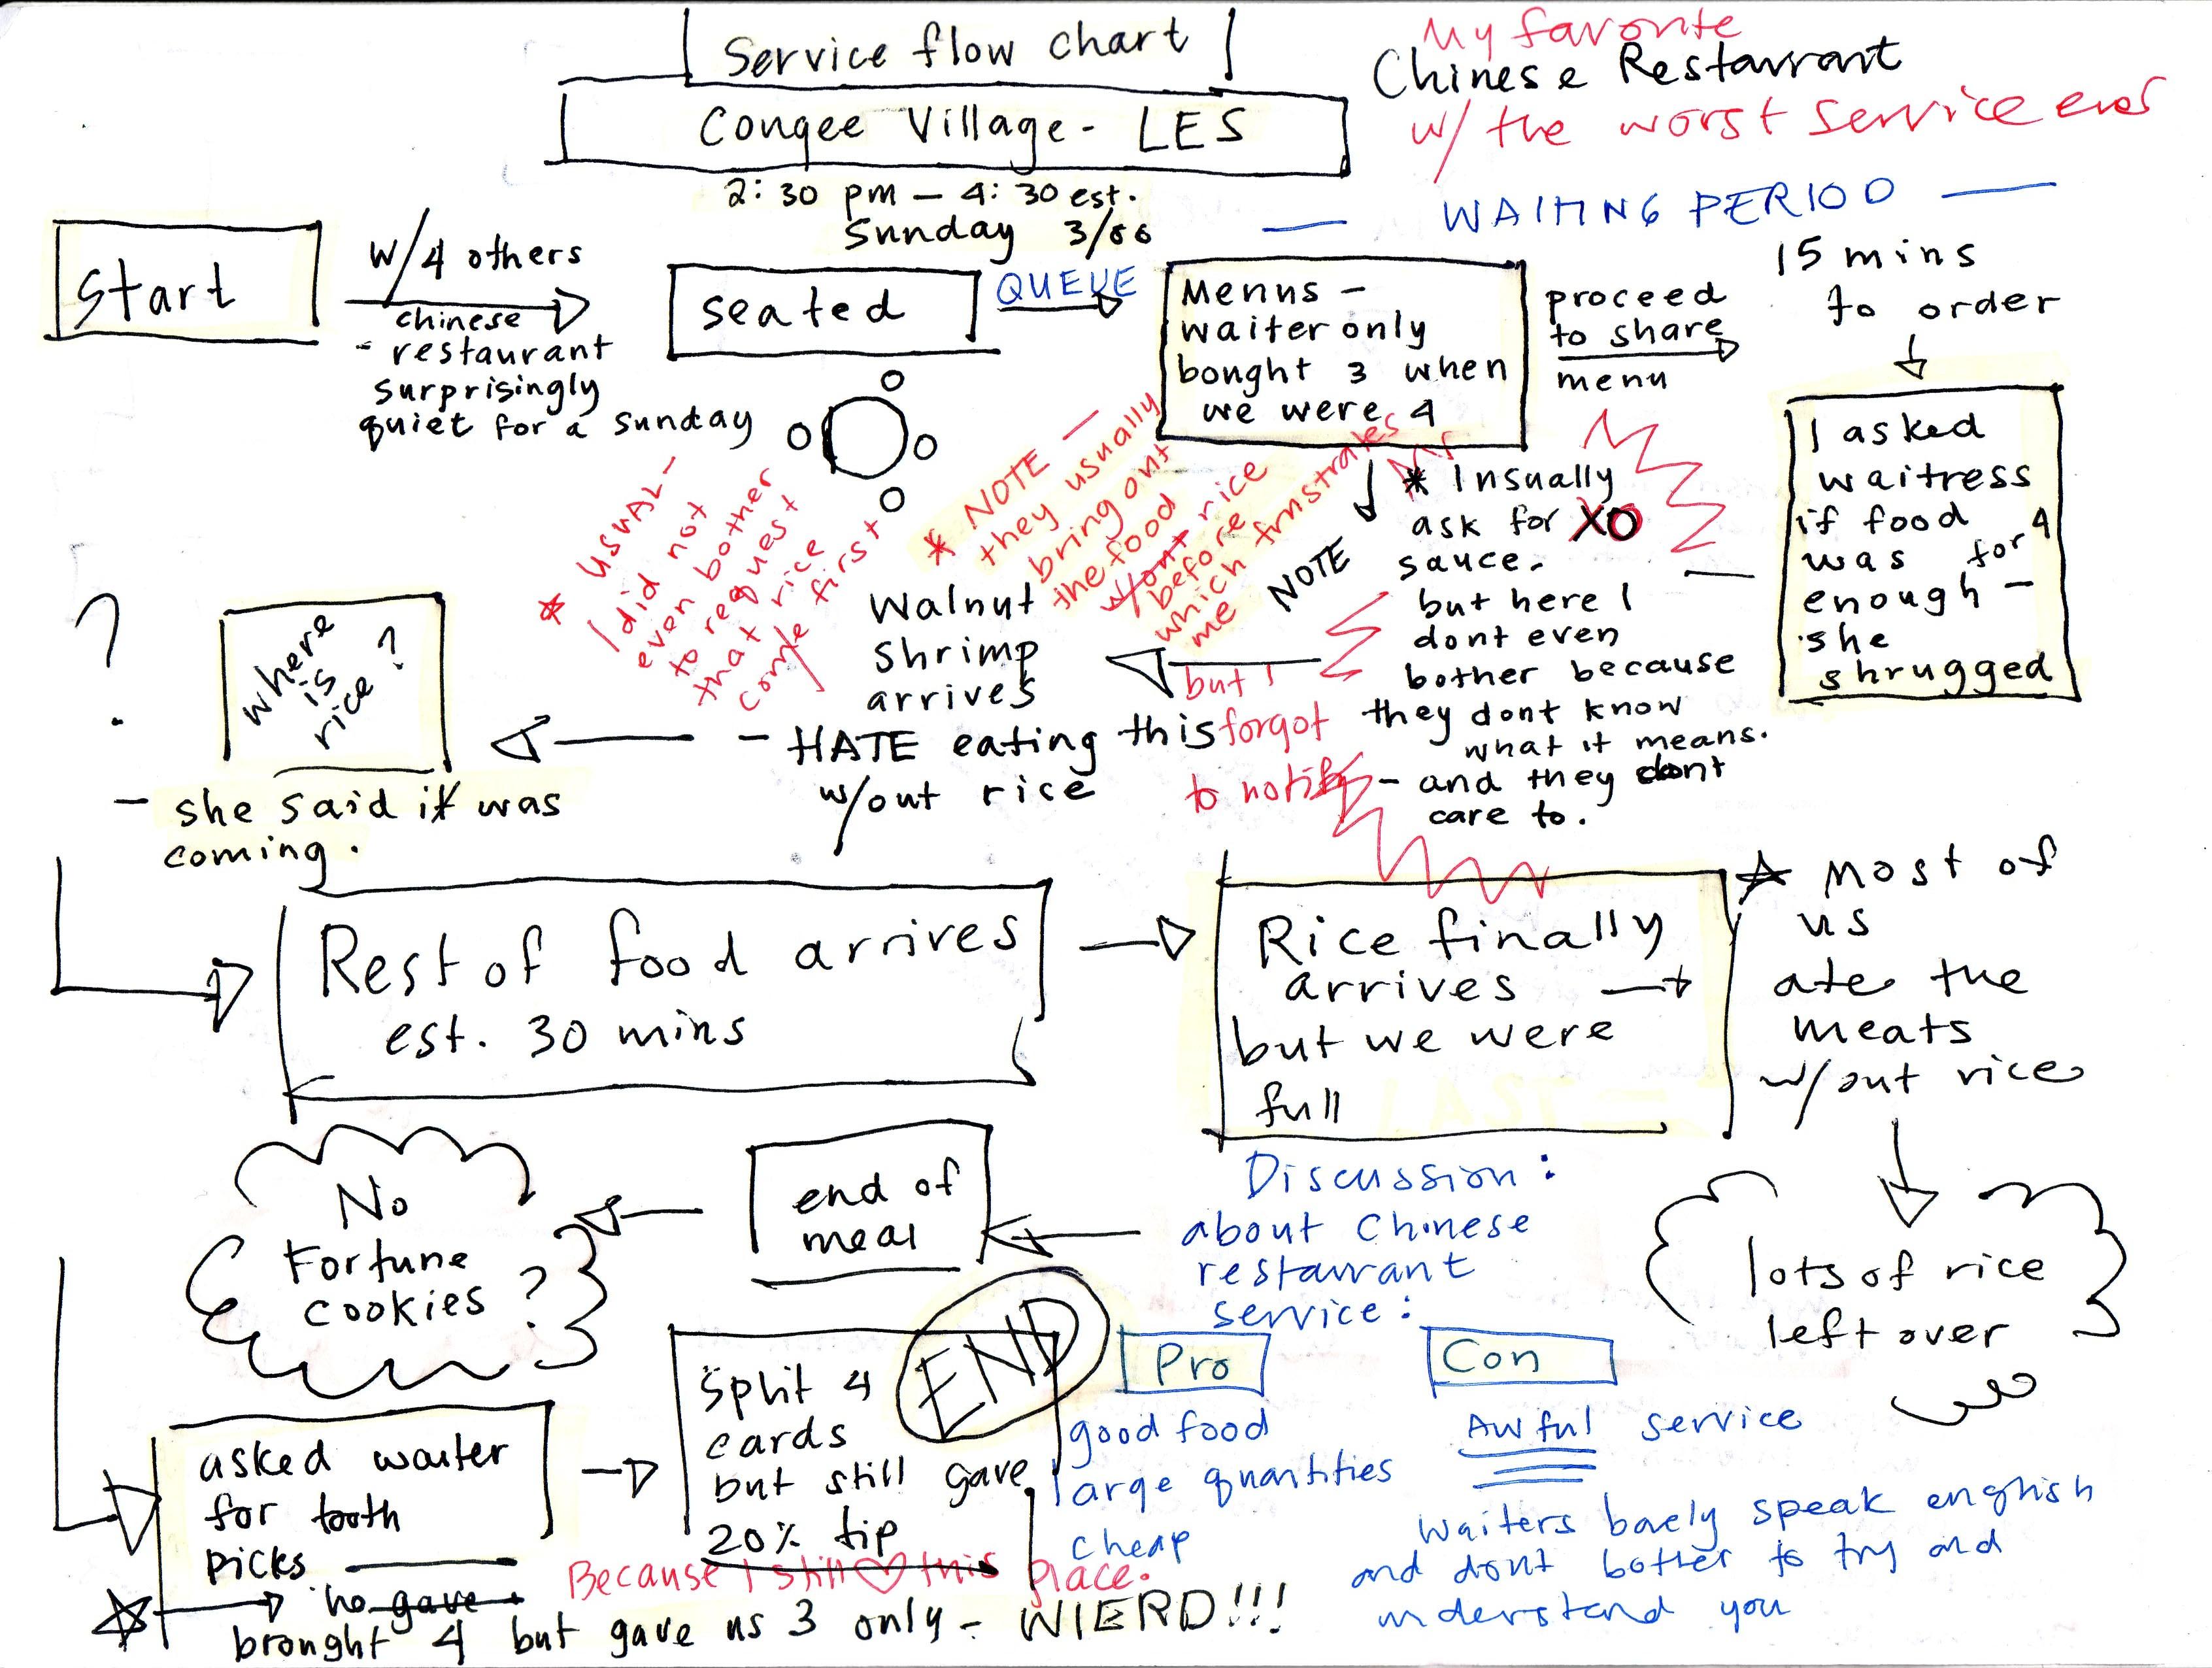 itil process diagram visio hvac transformer wiring flowchart in word